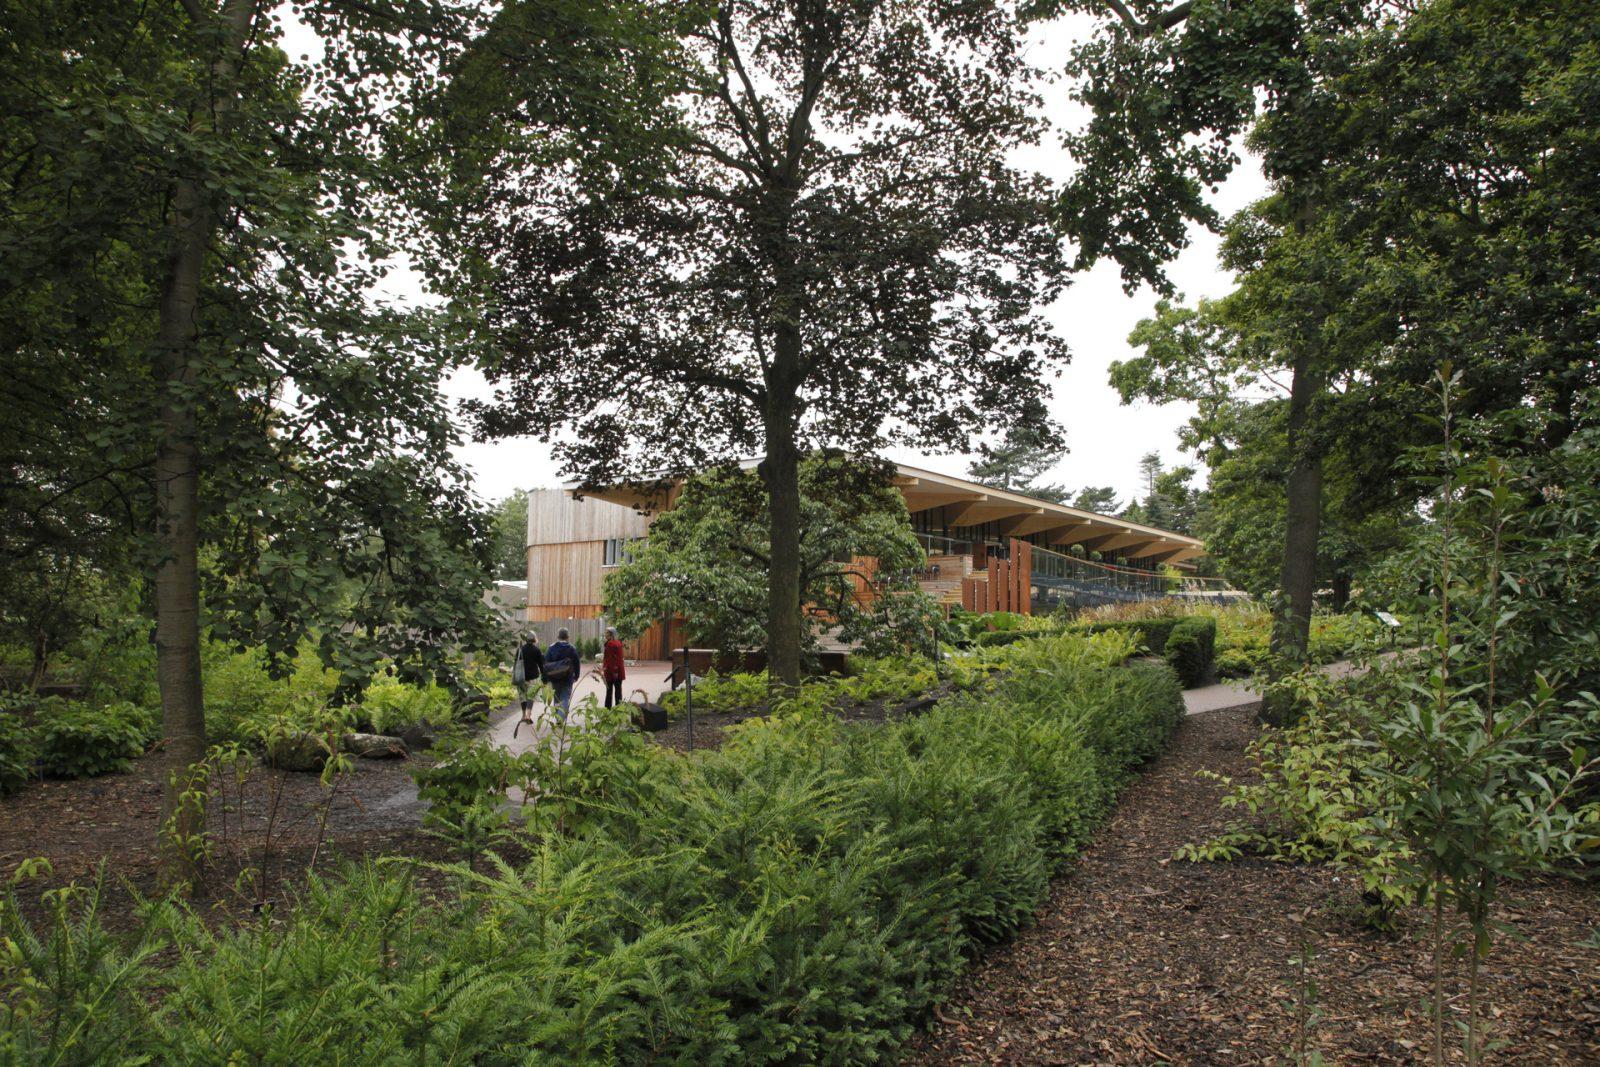 Scotland Corporate Travel Events - Royal Botanic Garden, Edinburgh